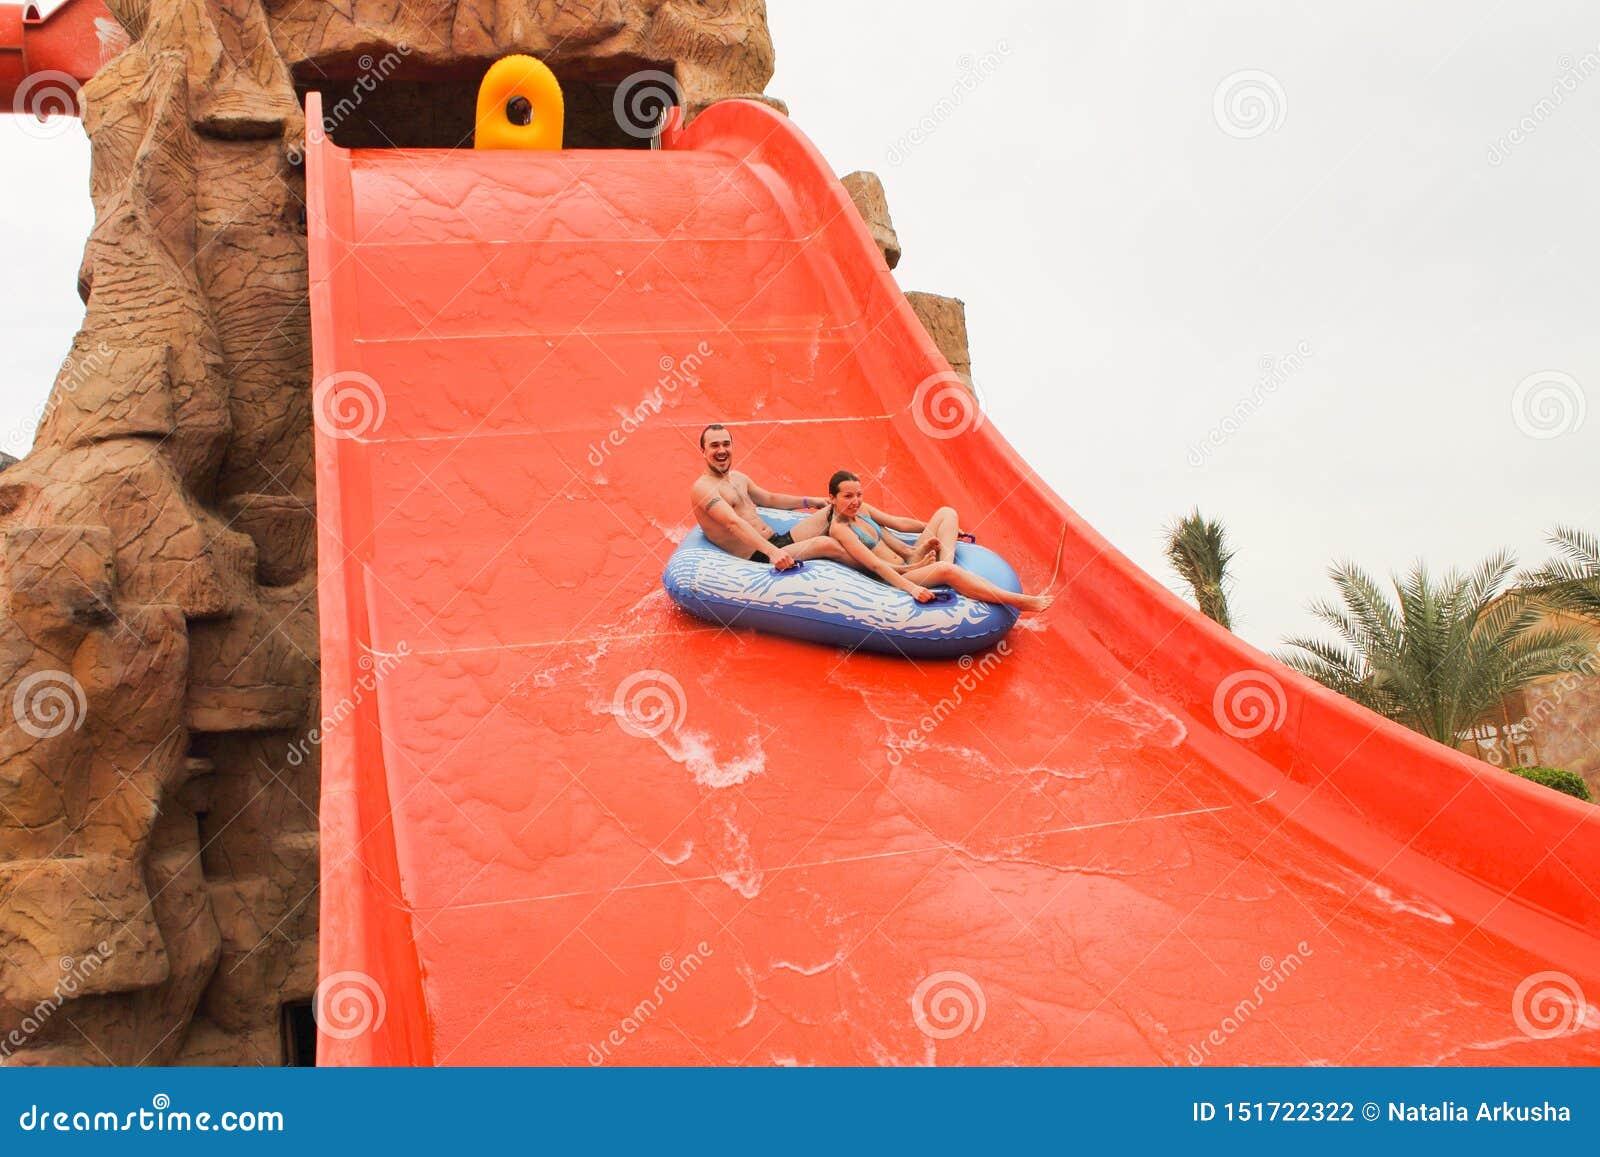 Descent on the water slide in aqua park